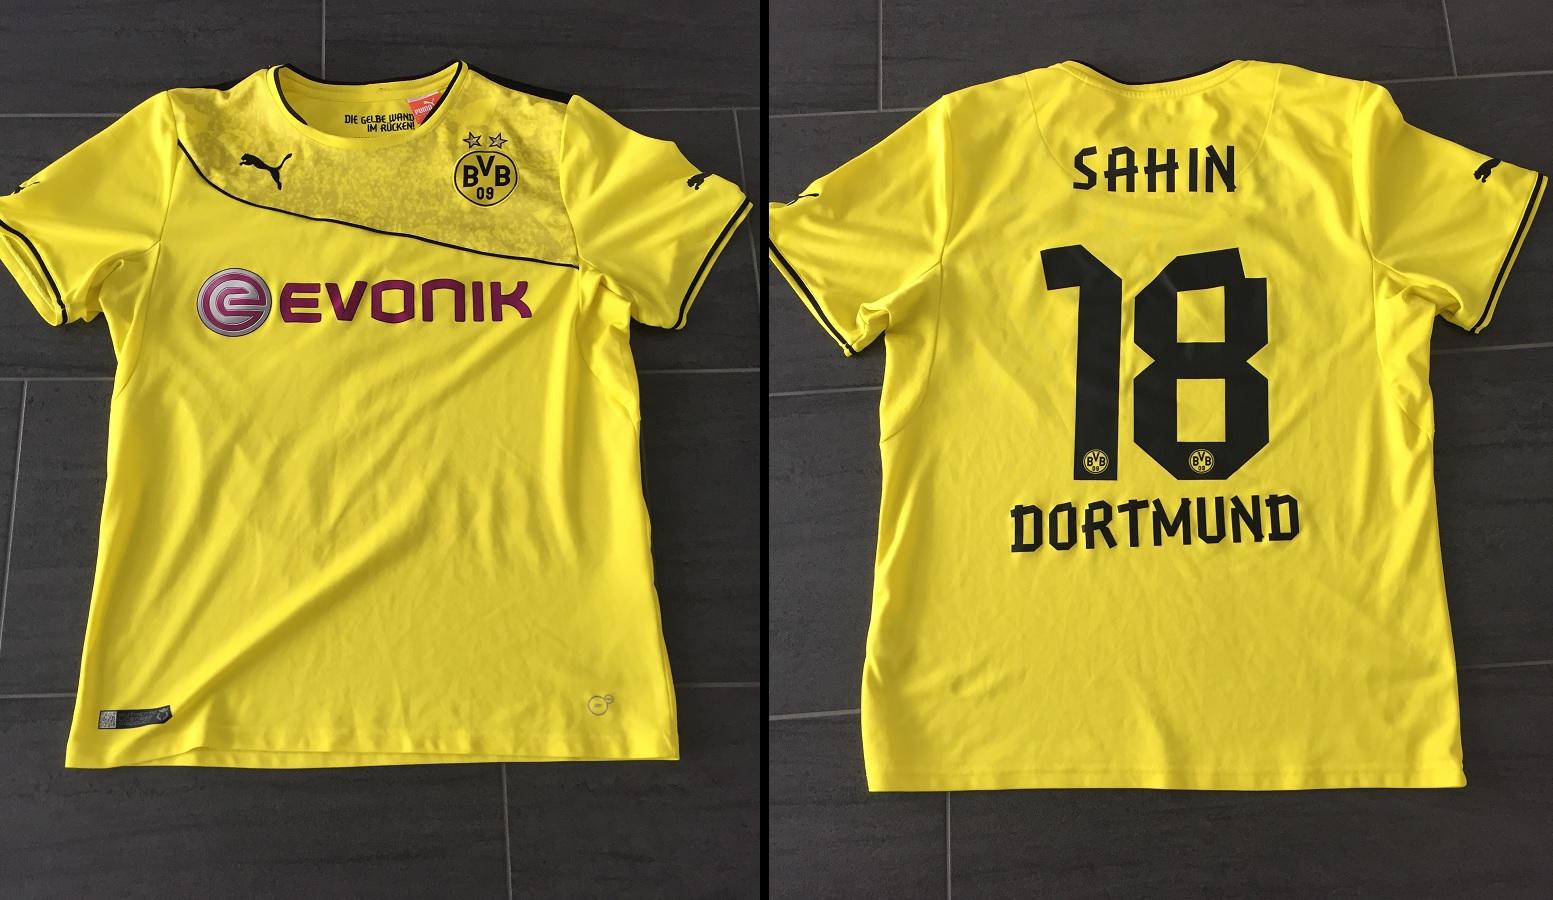 Borussia Dortmund X-mas 2013/14 Sahin